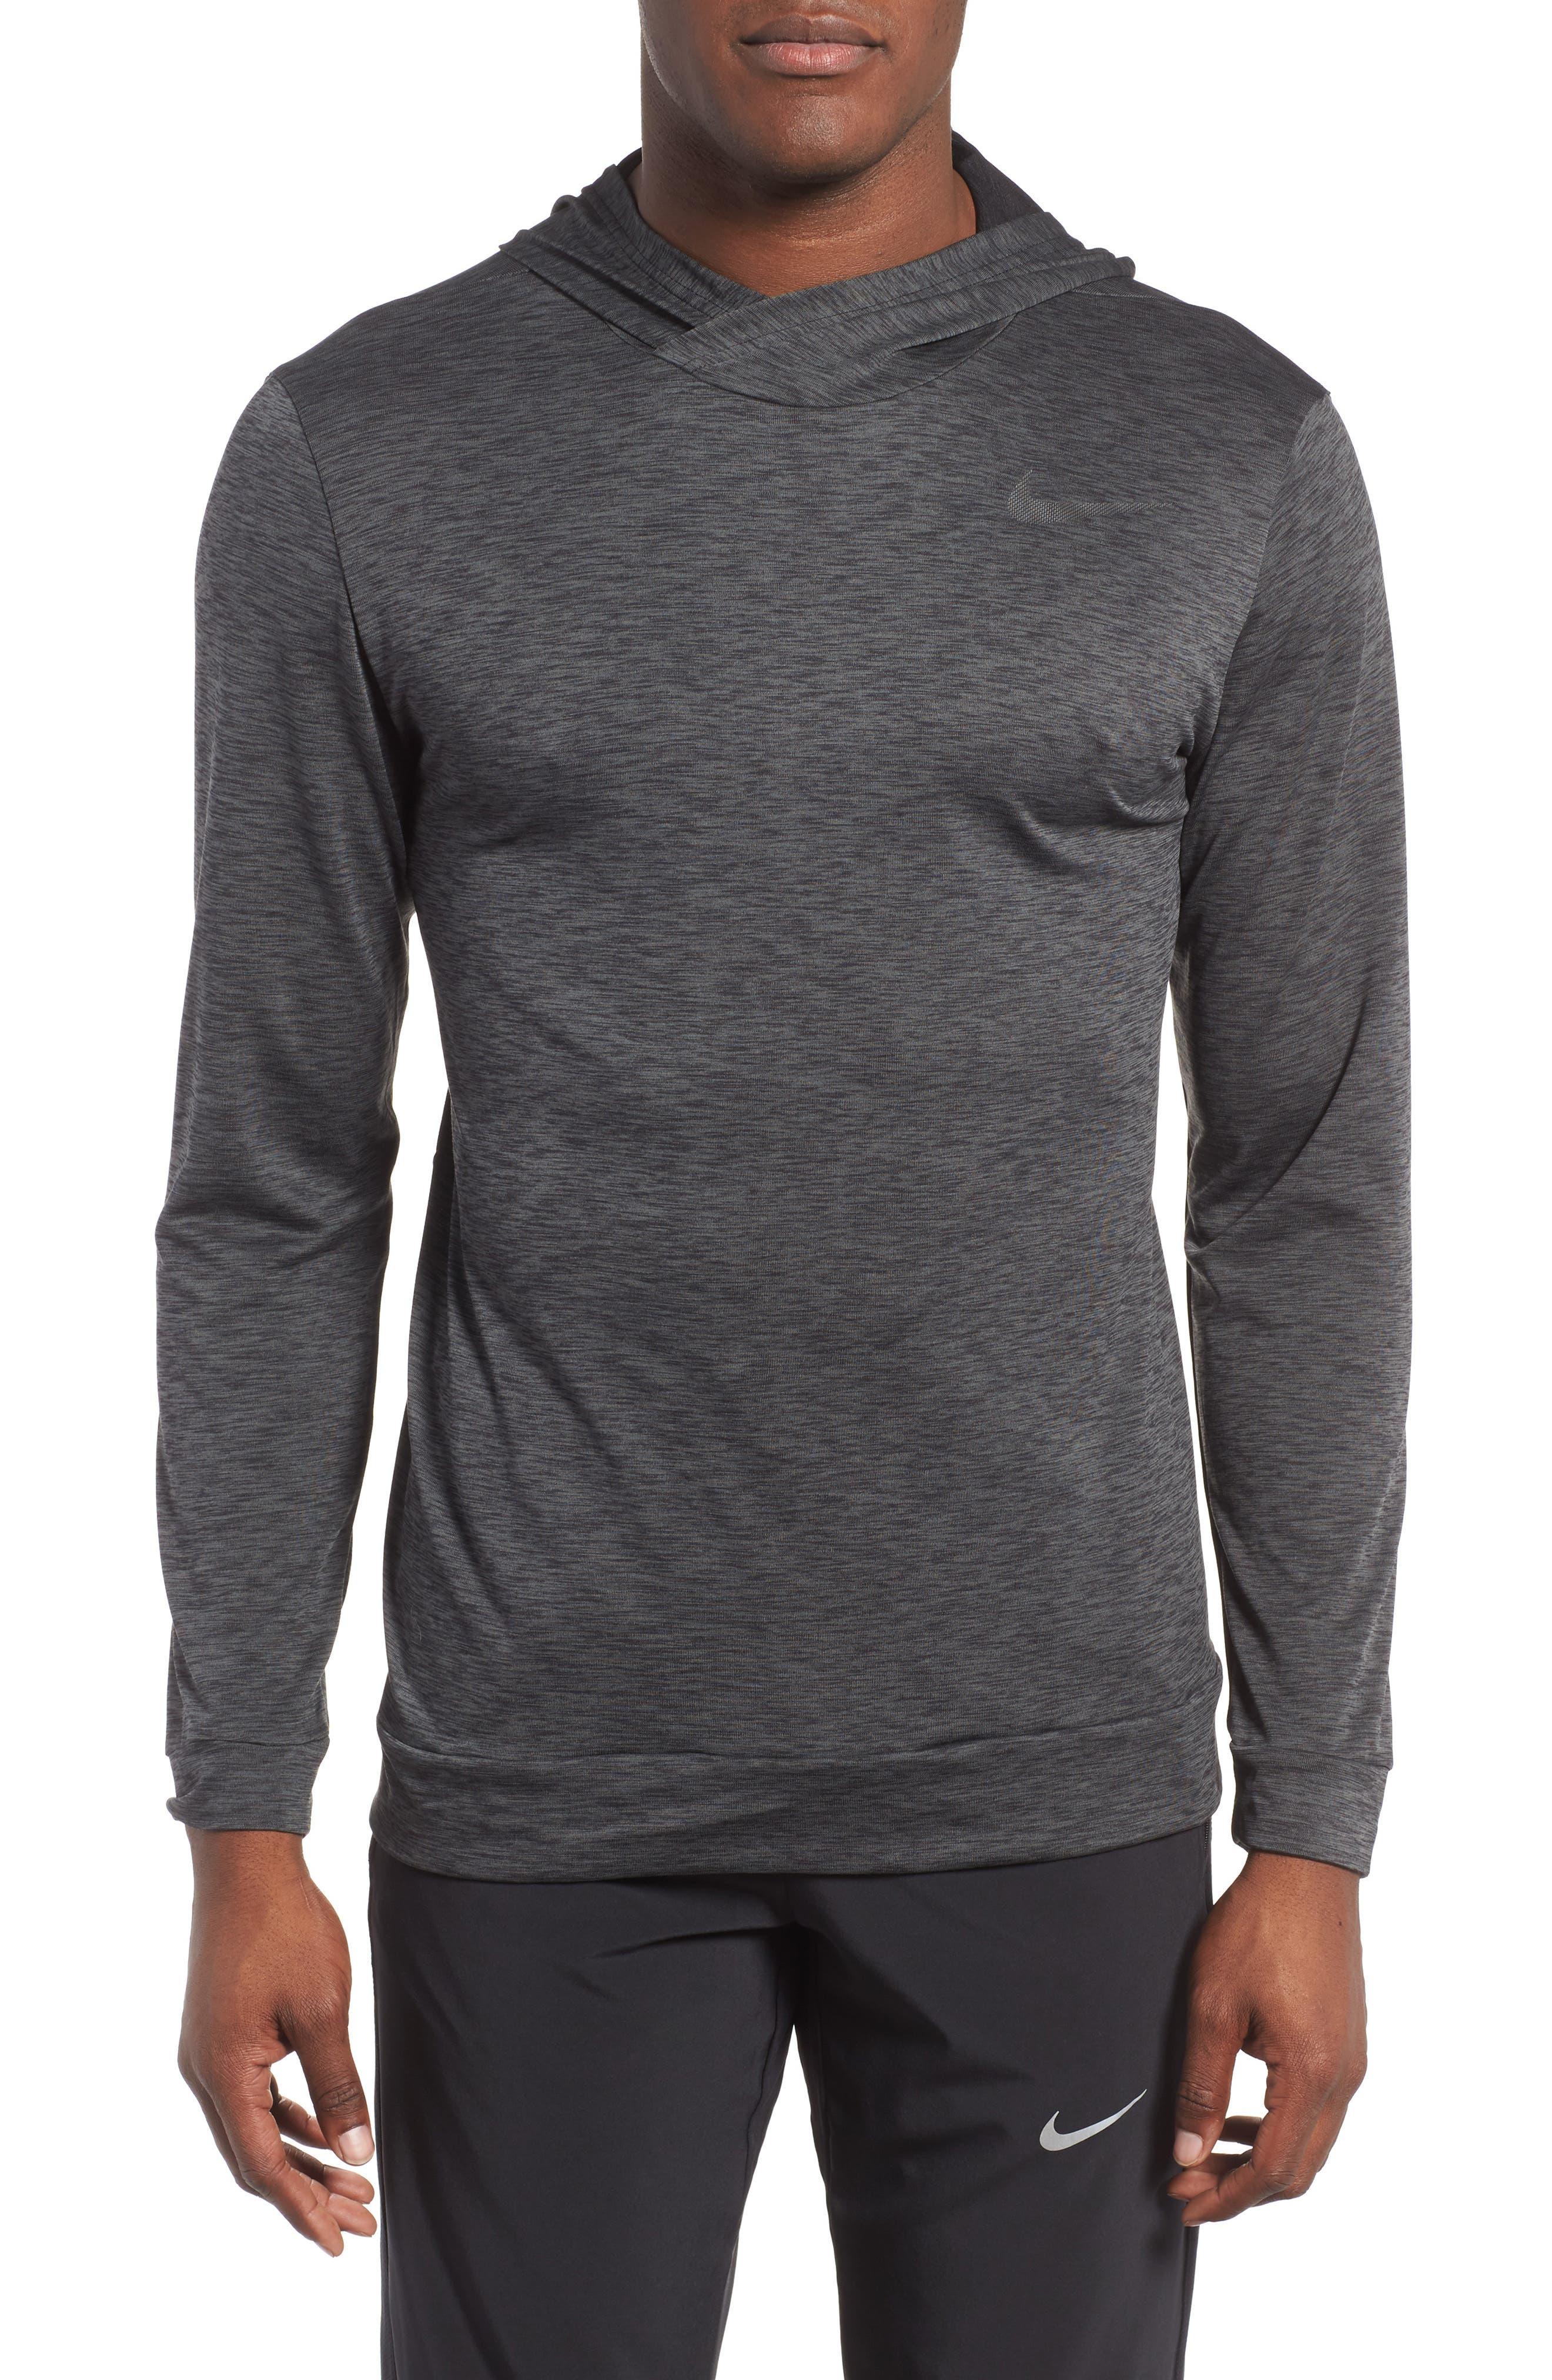 Hyper Dry Regular Fit Training Hoodie,                             Main thumbnail 1, color,                             ANTHRACITE/BLACK/BLACK